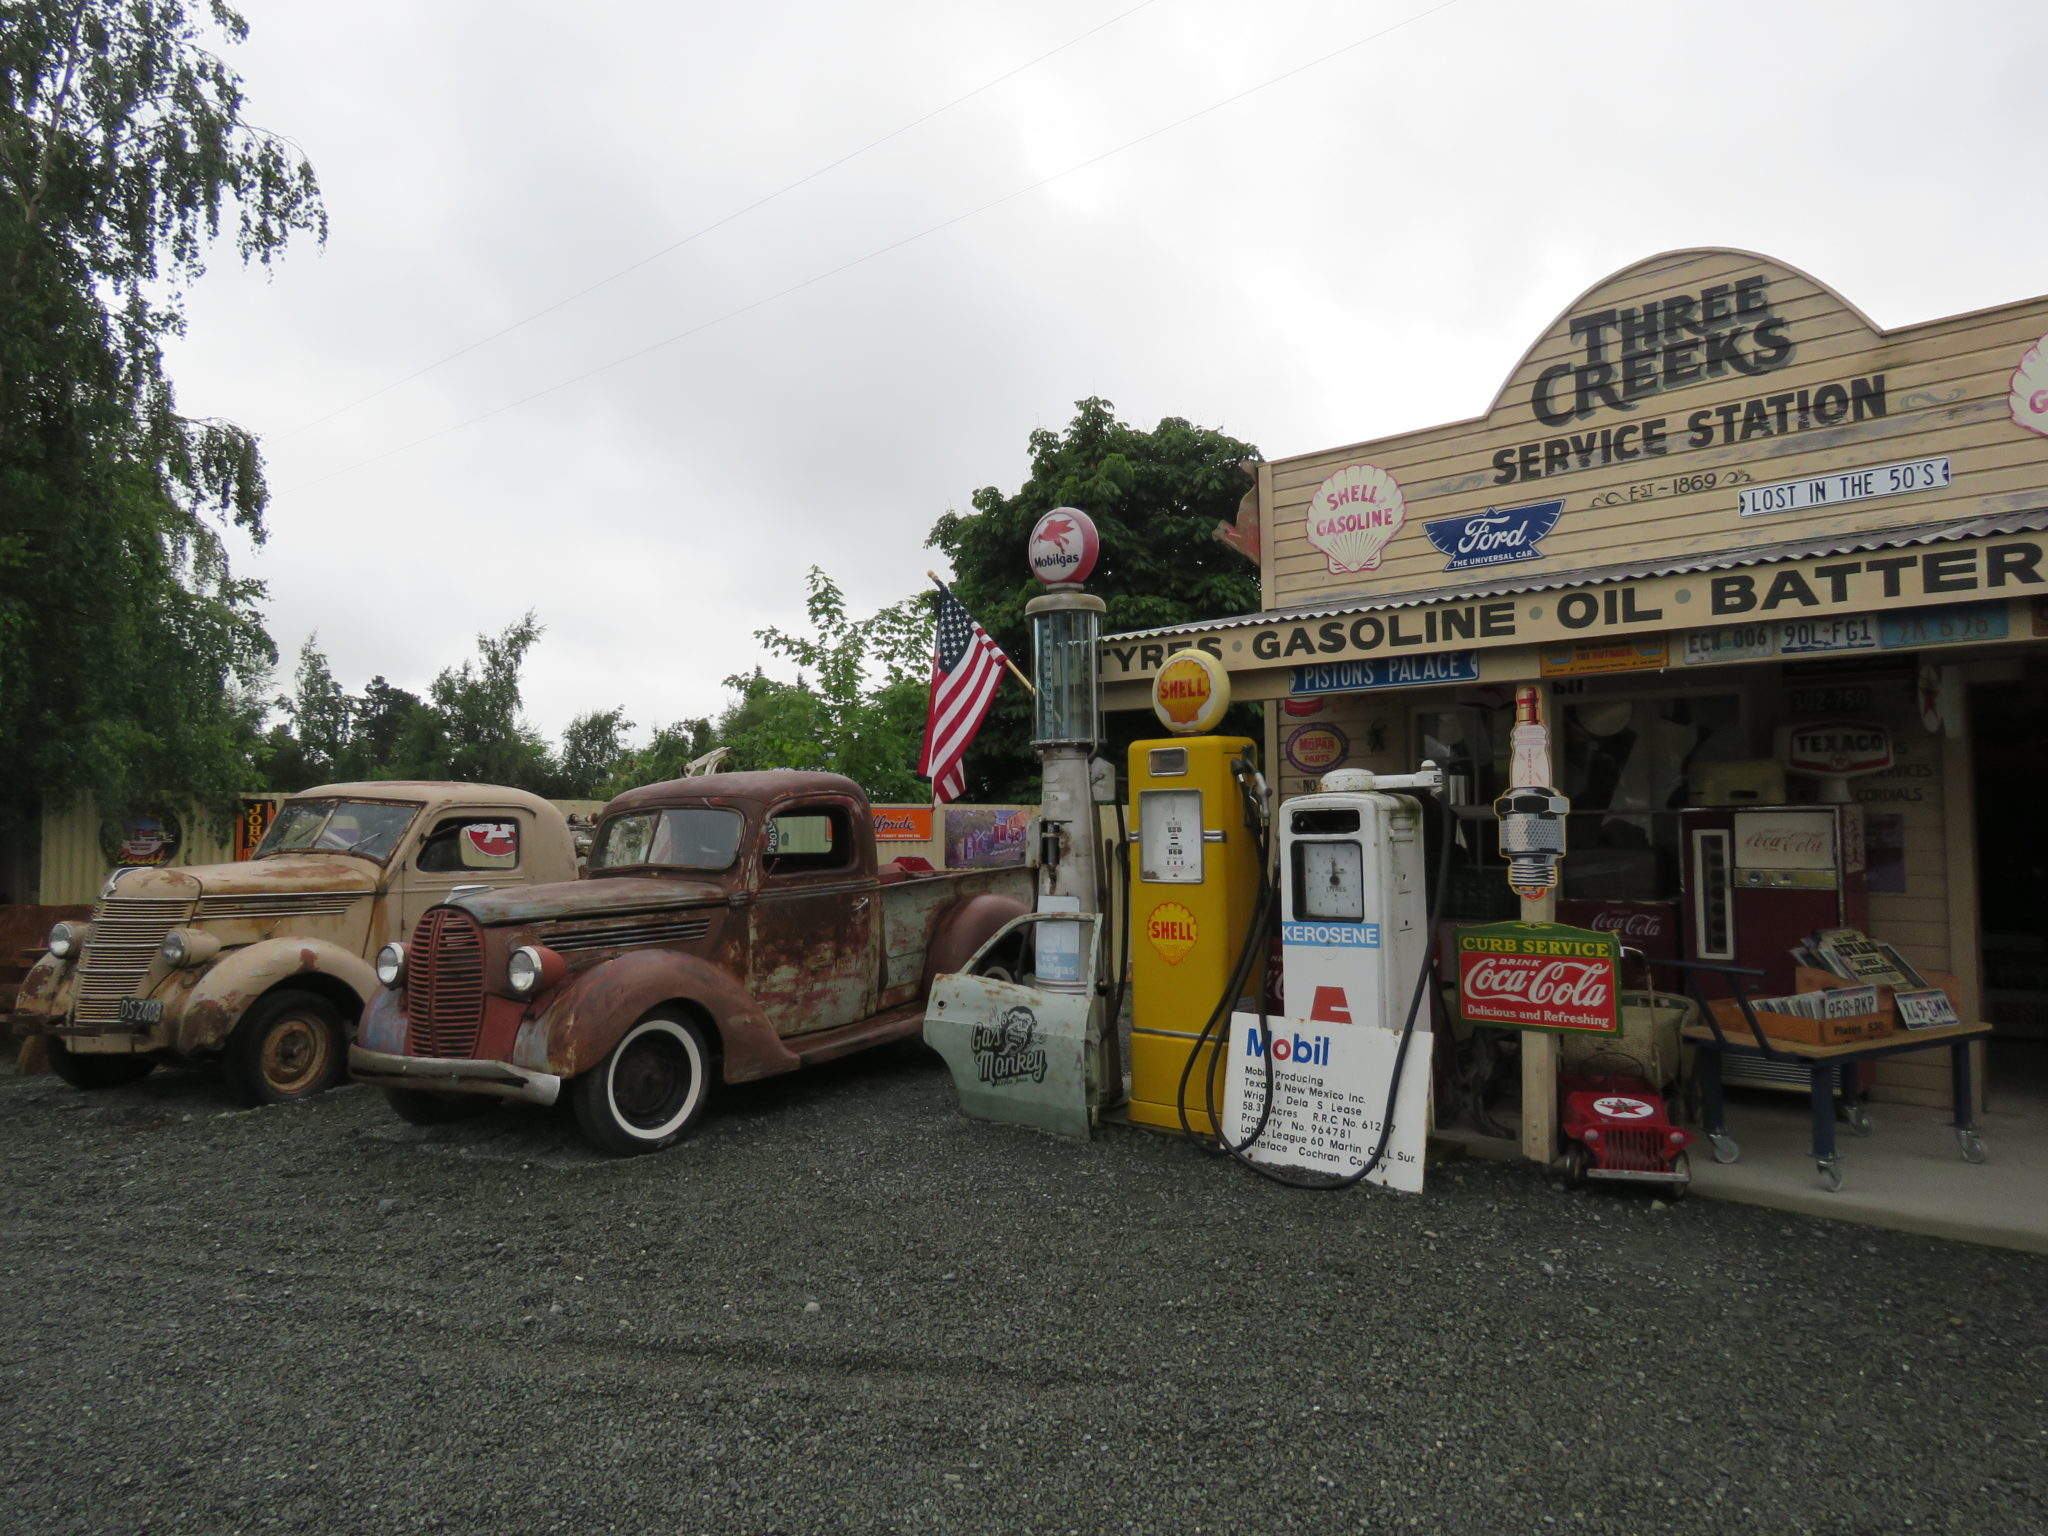 Tree Creeks Service Station